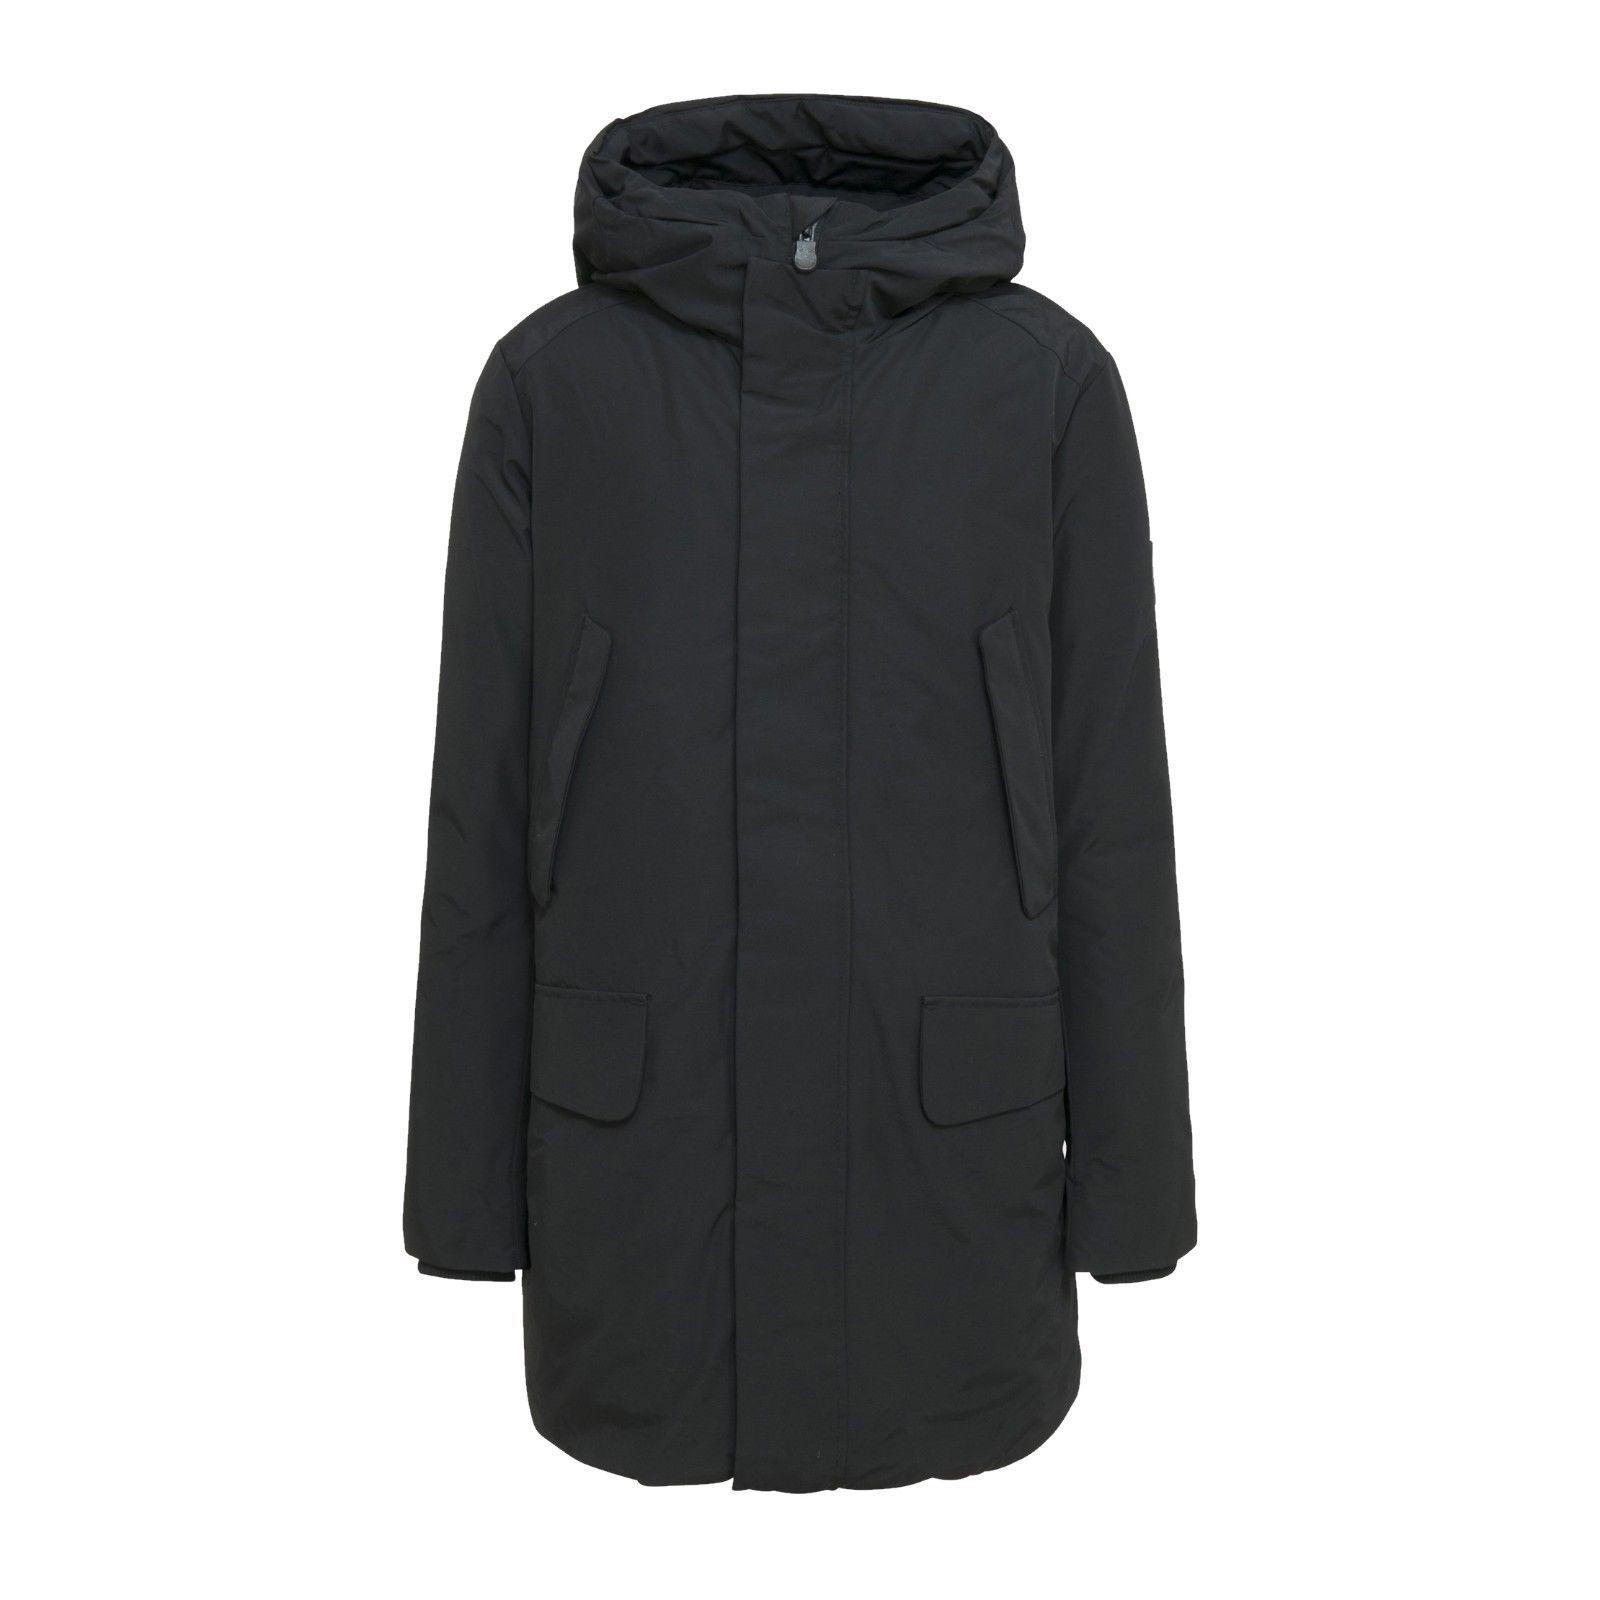 598 00 Save The Duck Men S Plumtech Fill Hooded Copy Parka Winter Coat Jacket Black Save Duck Mens Plumte Winter Coats Jackets Coats Jackets Jackets [ 1600 x 1600 Pixel ]